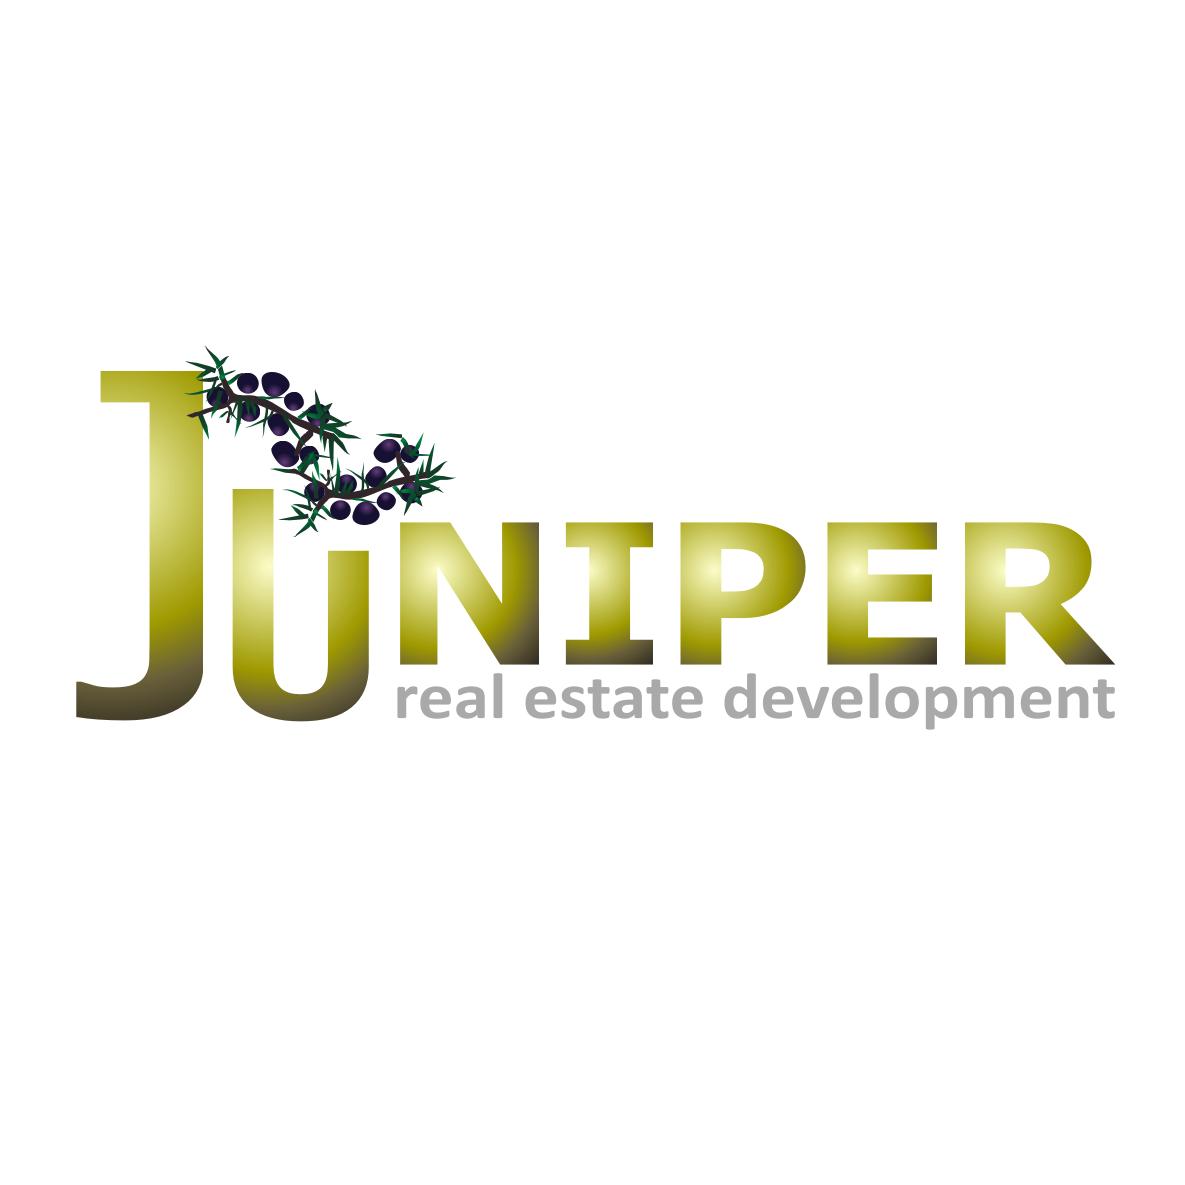 Logo Design by ElisG - Entry No. 19 in the Logo Design Contest Juniper.